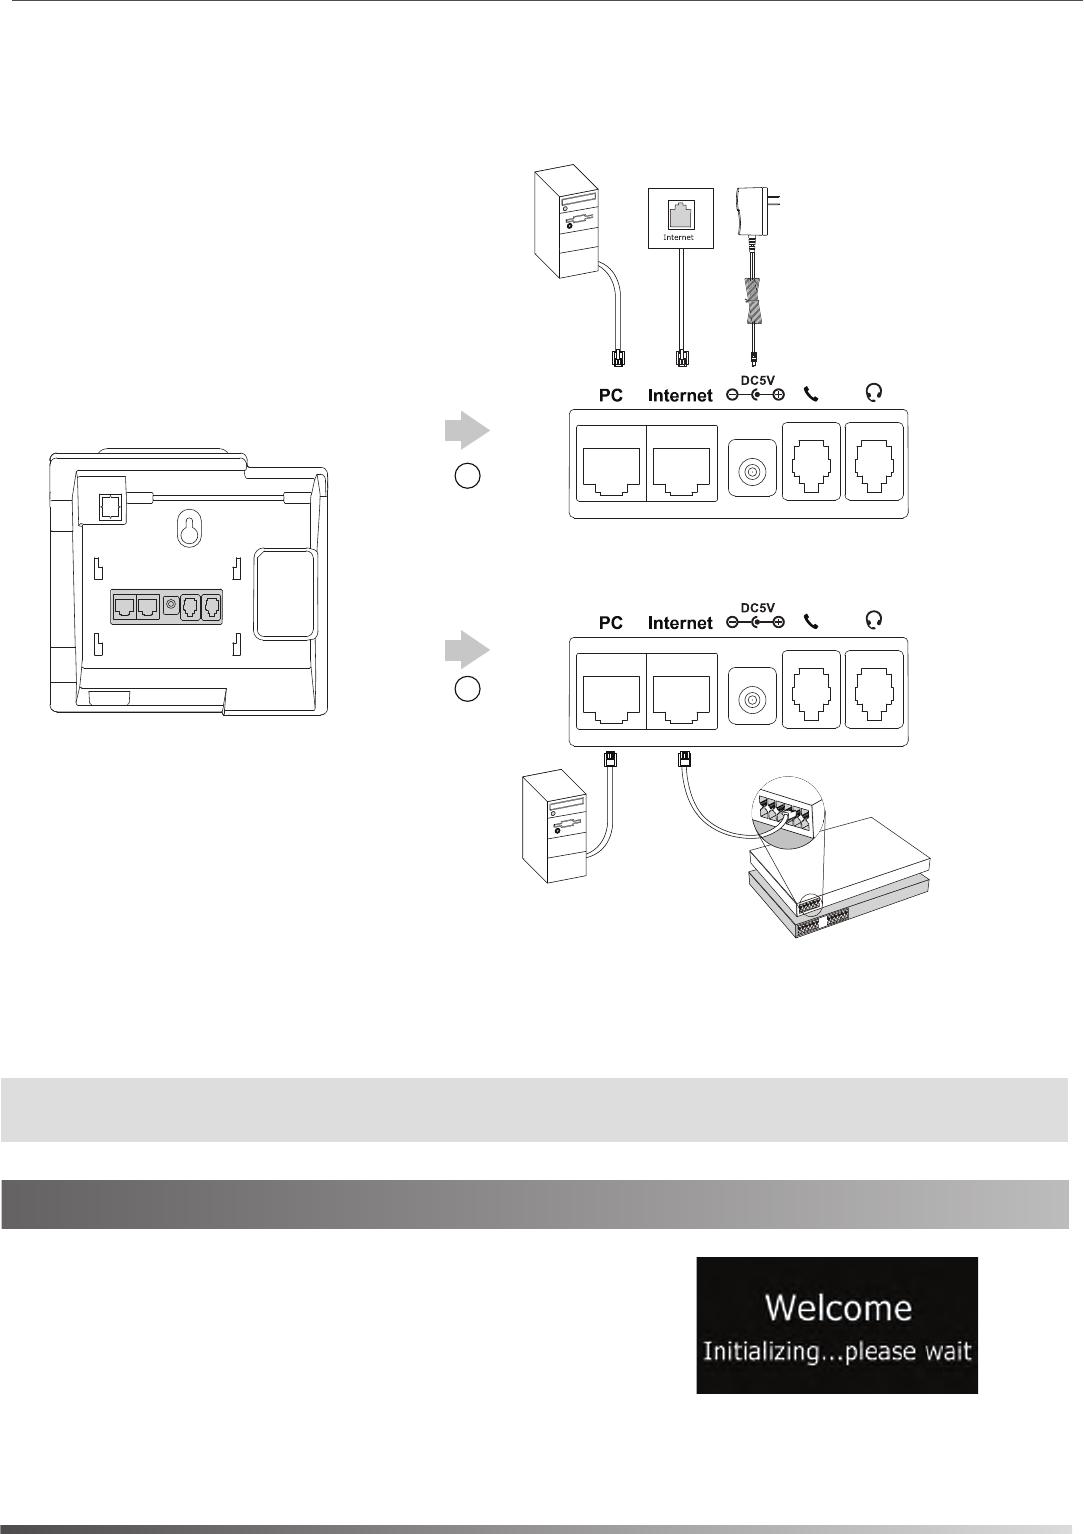 YEALINK T61P IP Phone User Manual SIP T61 T61P T61G Quick